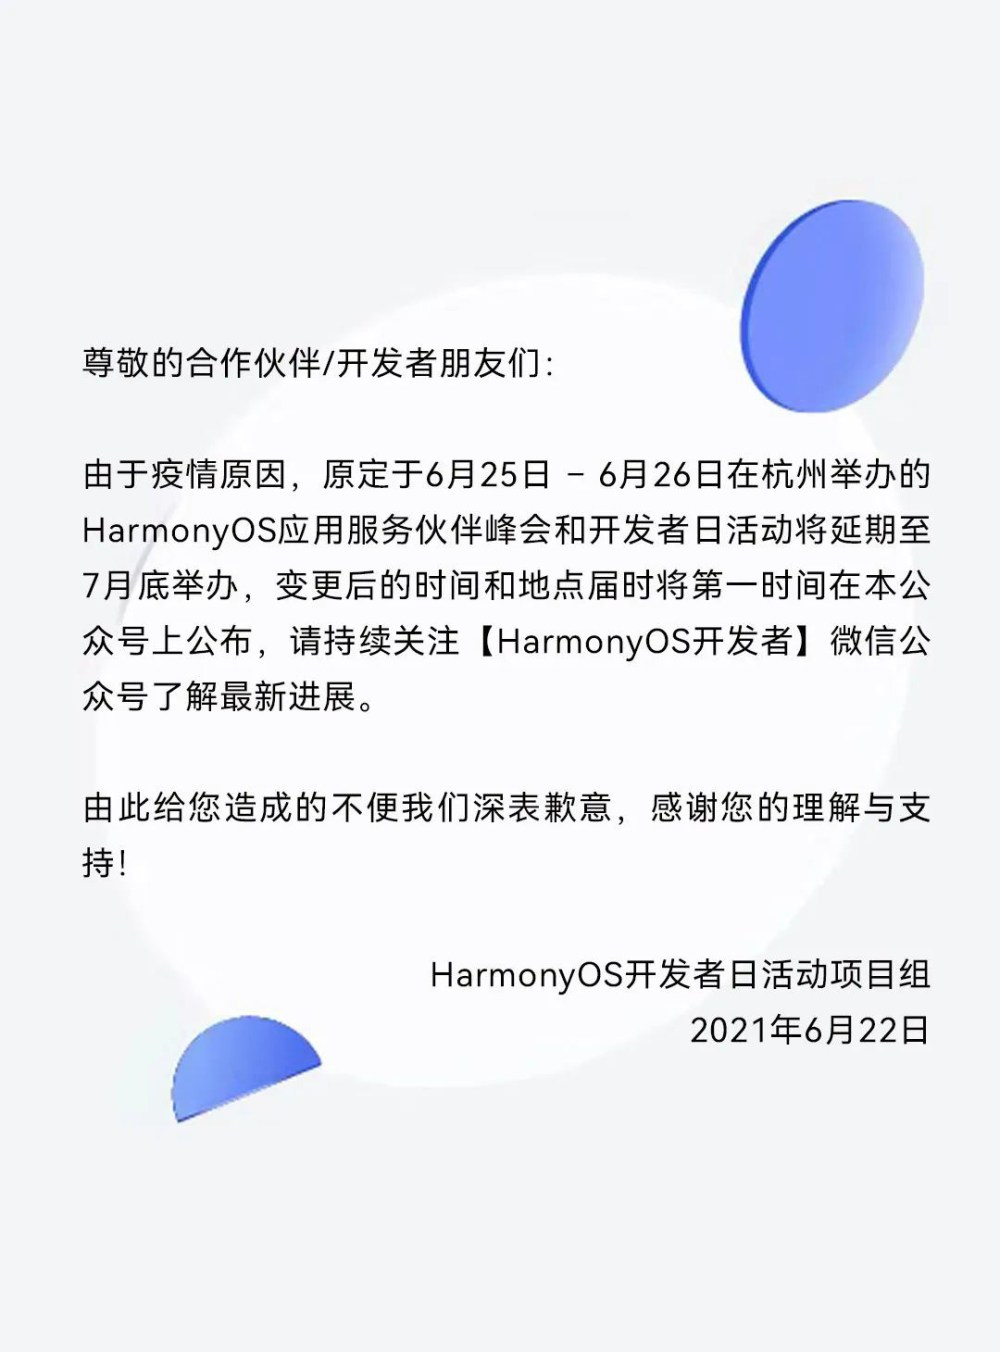 Huawei HarmonyOS Application Service Partner Summit